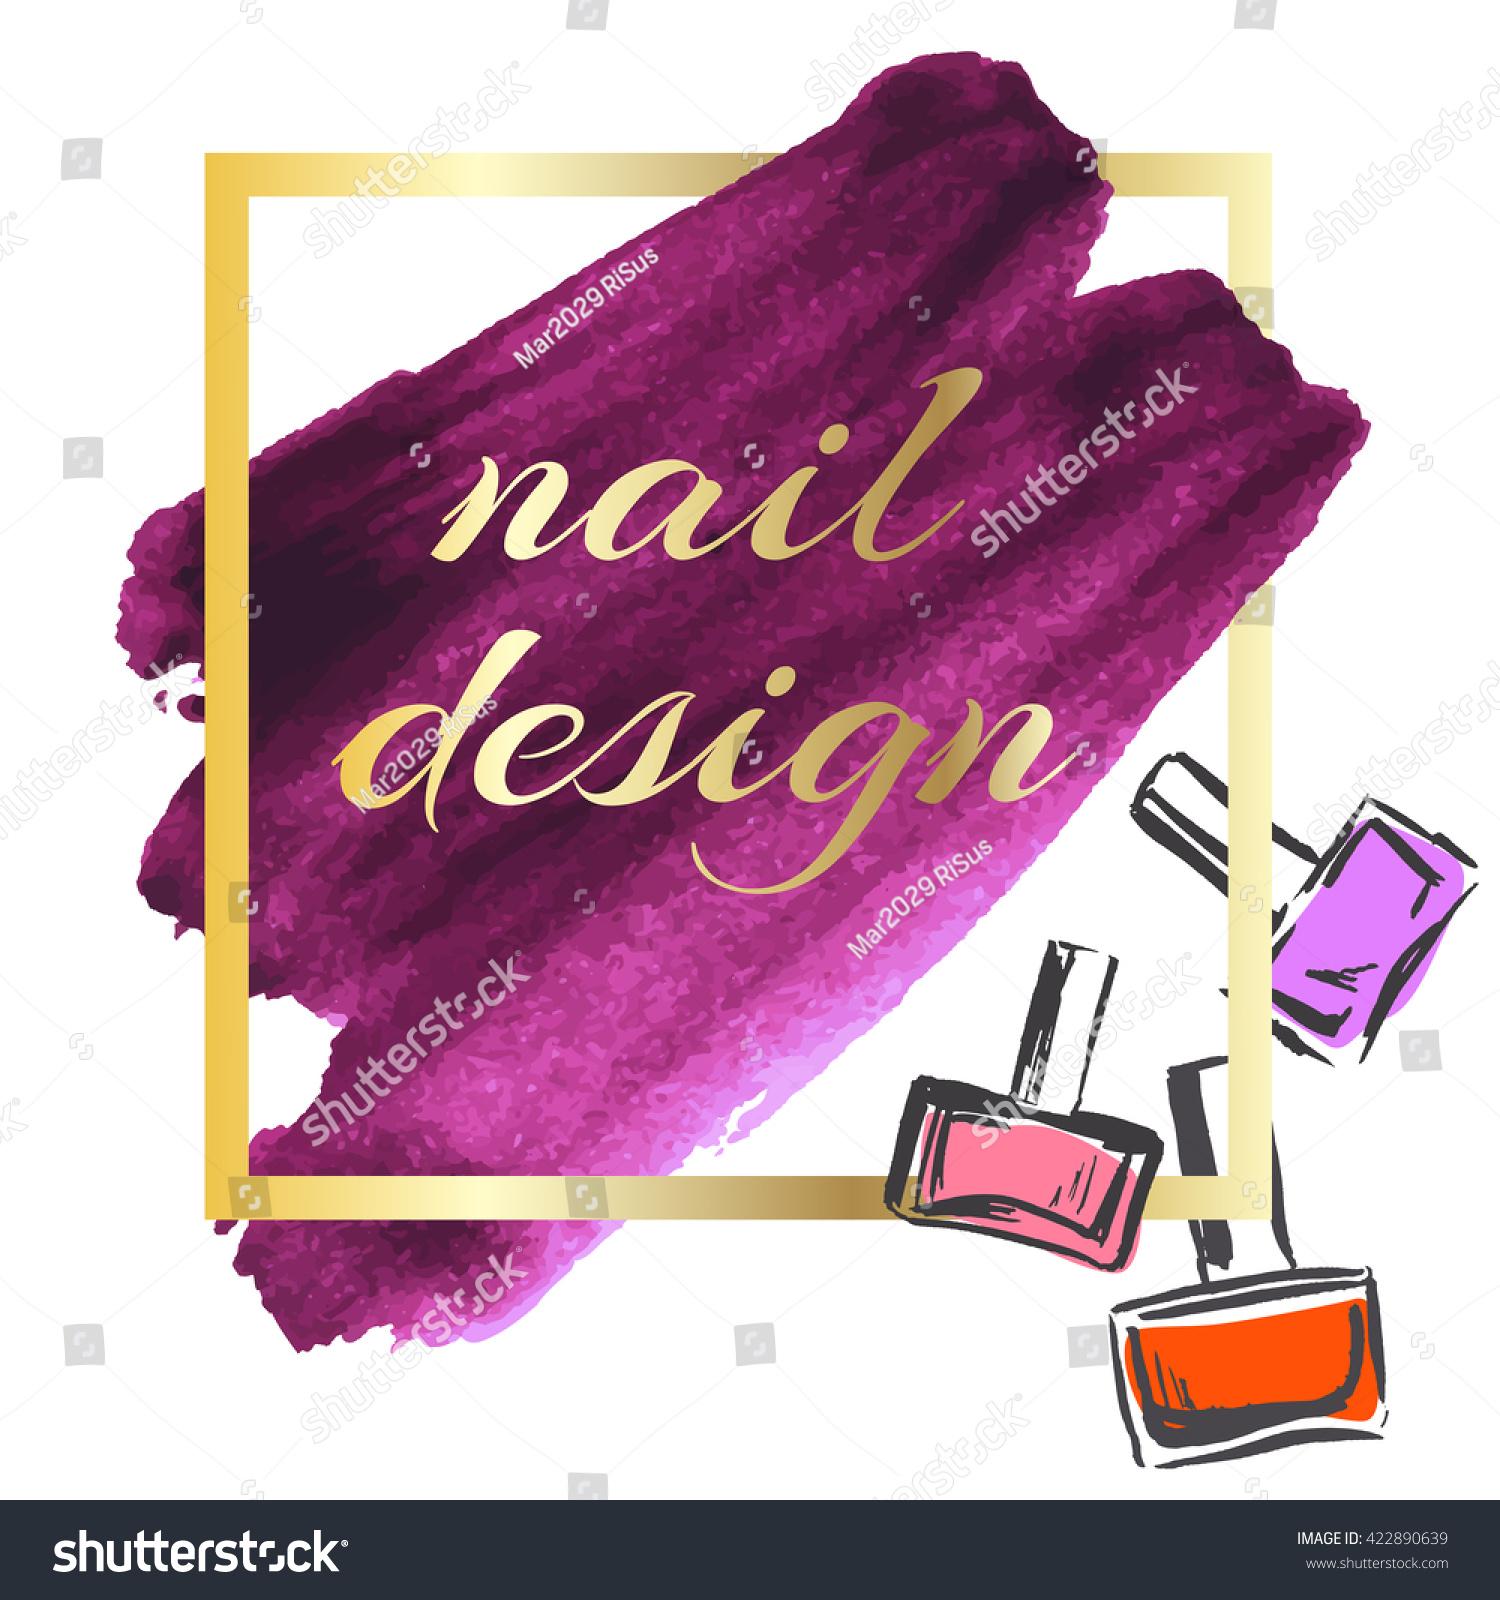 banner nail polish design leaflets flyers stock vector royalty free